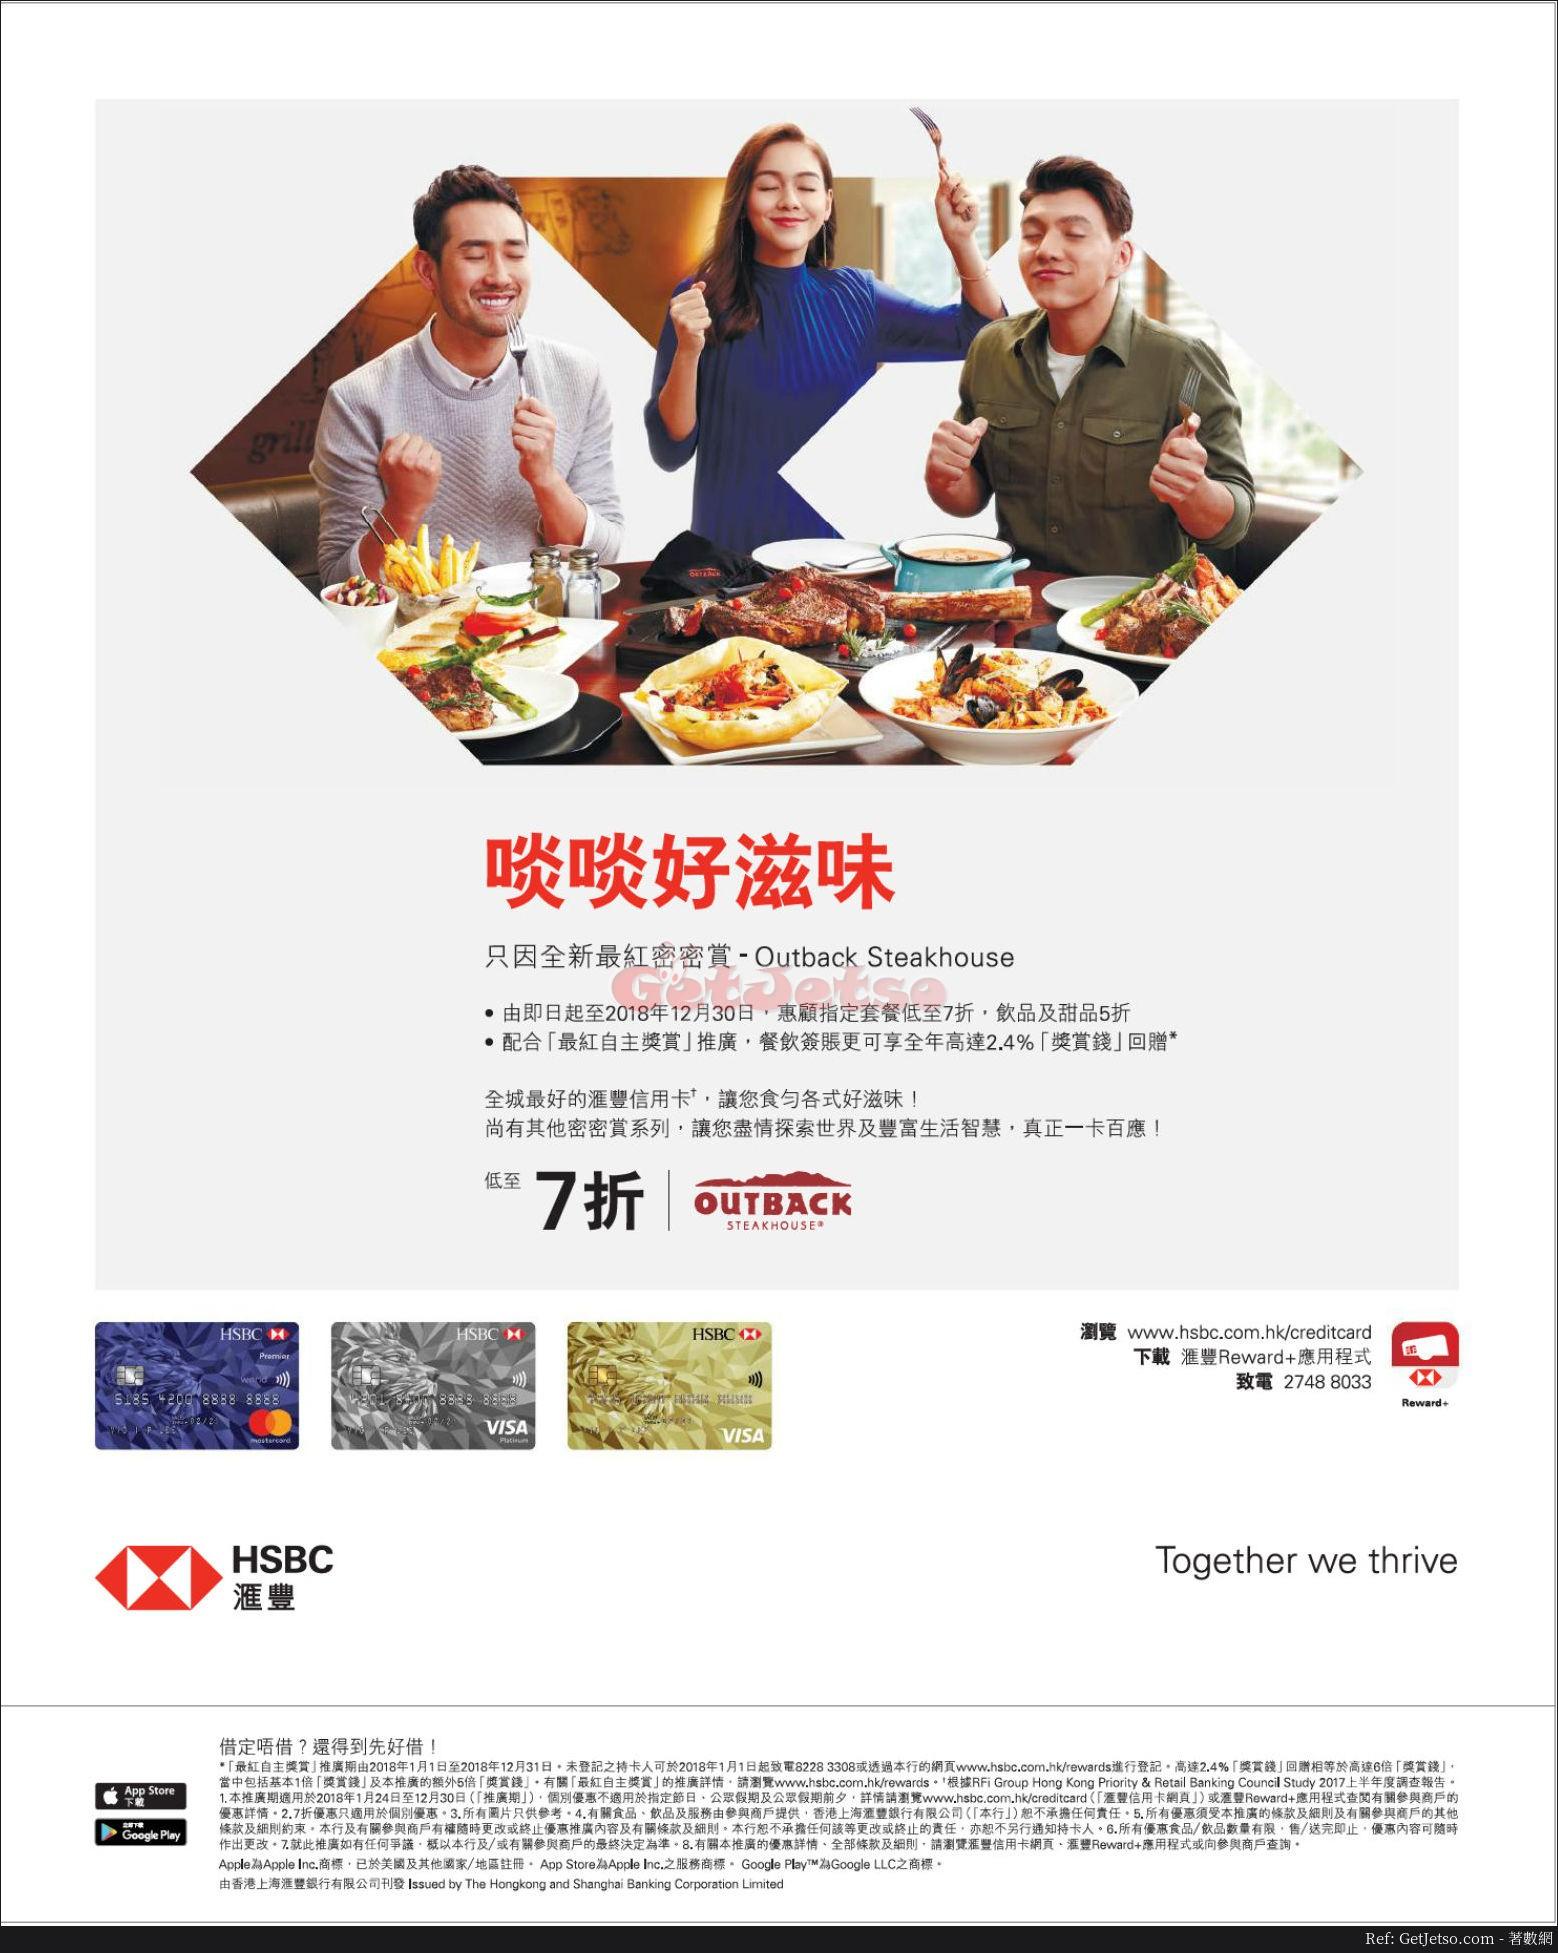 OUTBACK 低至7折優惠@匯豐信用卡(至18年12月30日)